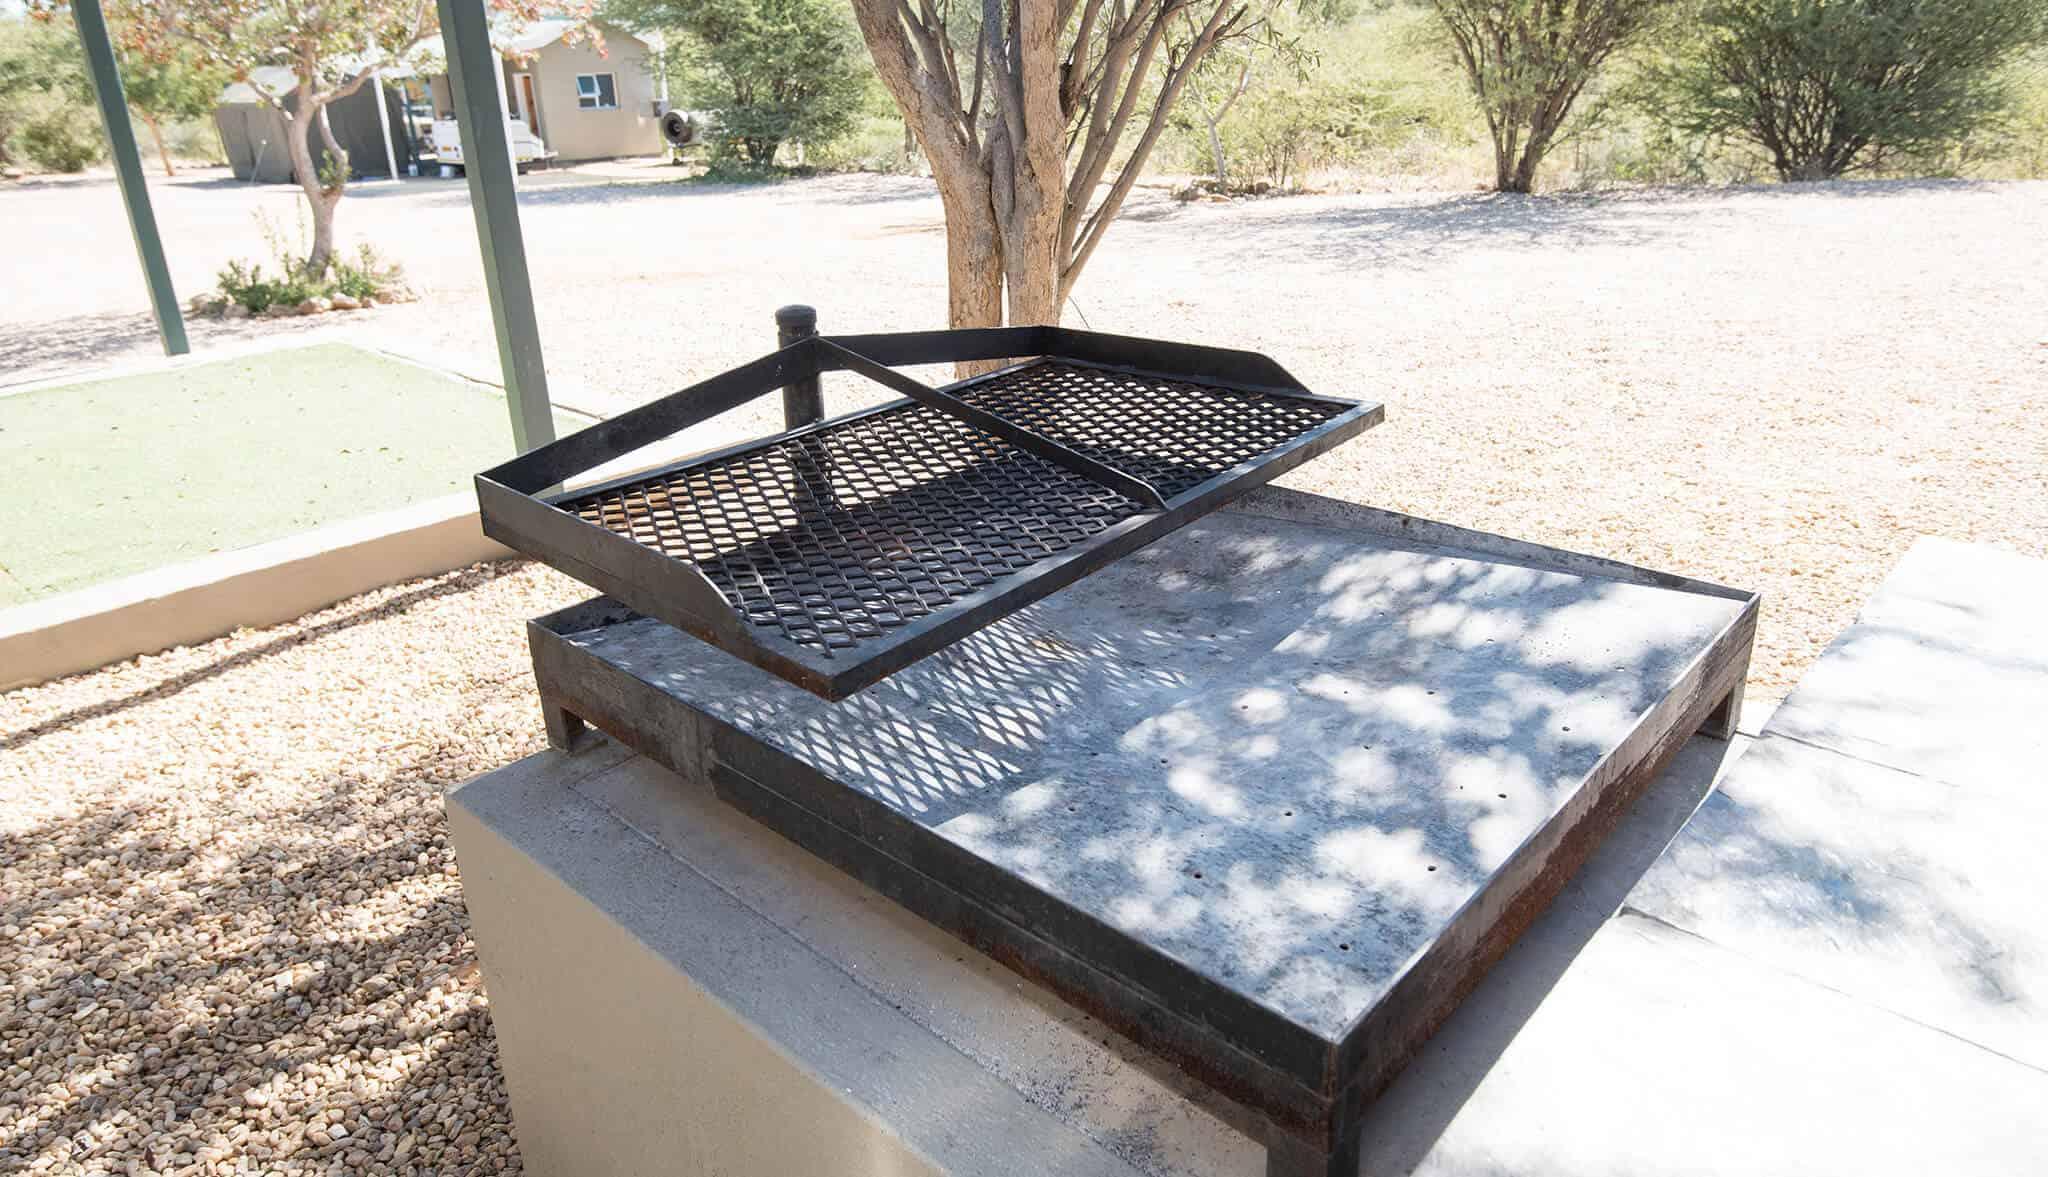 Luxury camping & caravanning sites | Braai facilities | Camping & caravanning sites in Windhoek | Arebbusch Travel Lodge